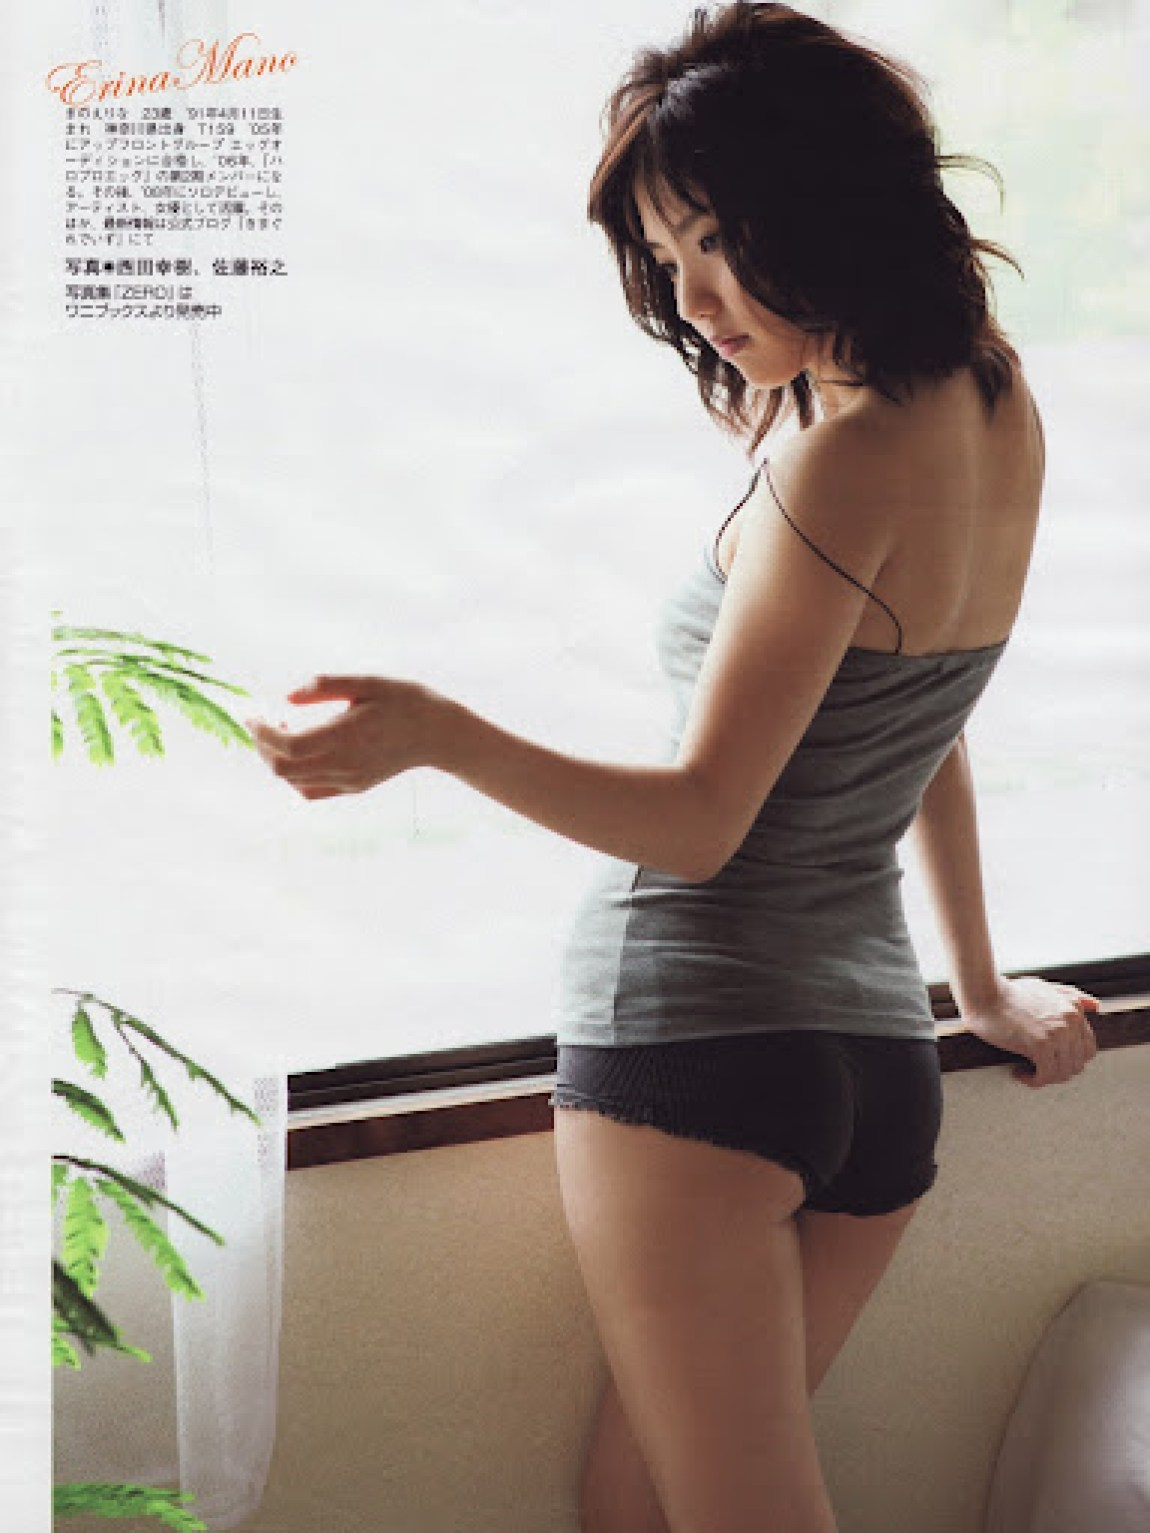 20147_magazine_mano-erina